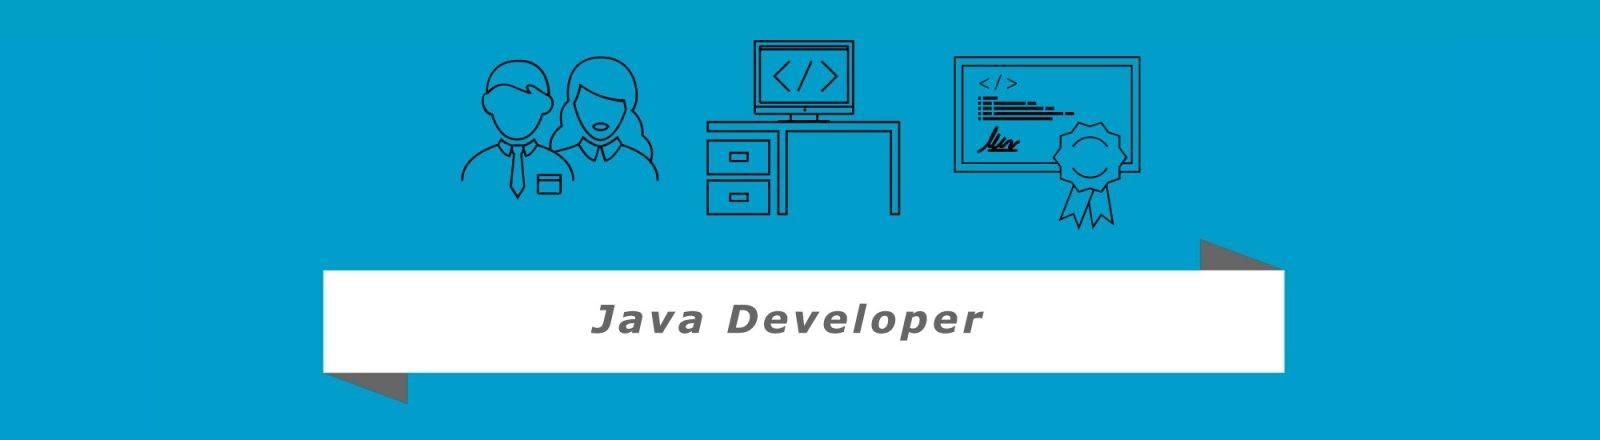 Recruiting ESIS Srl Java Developer